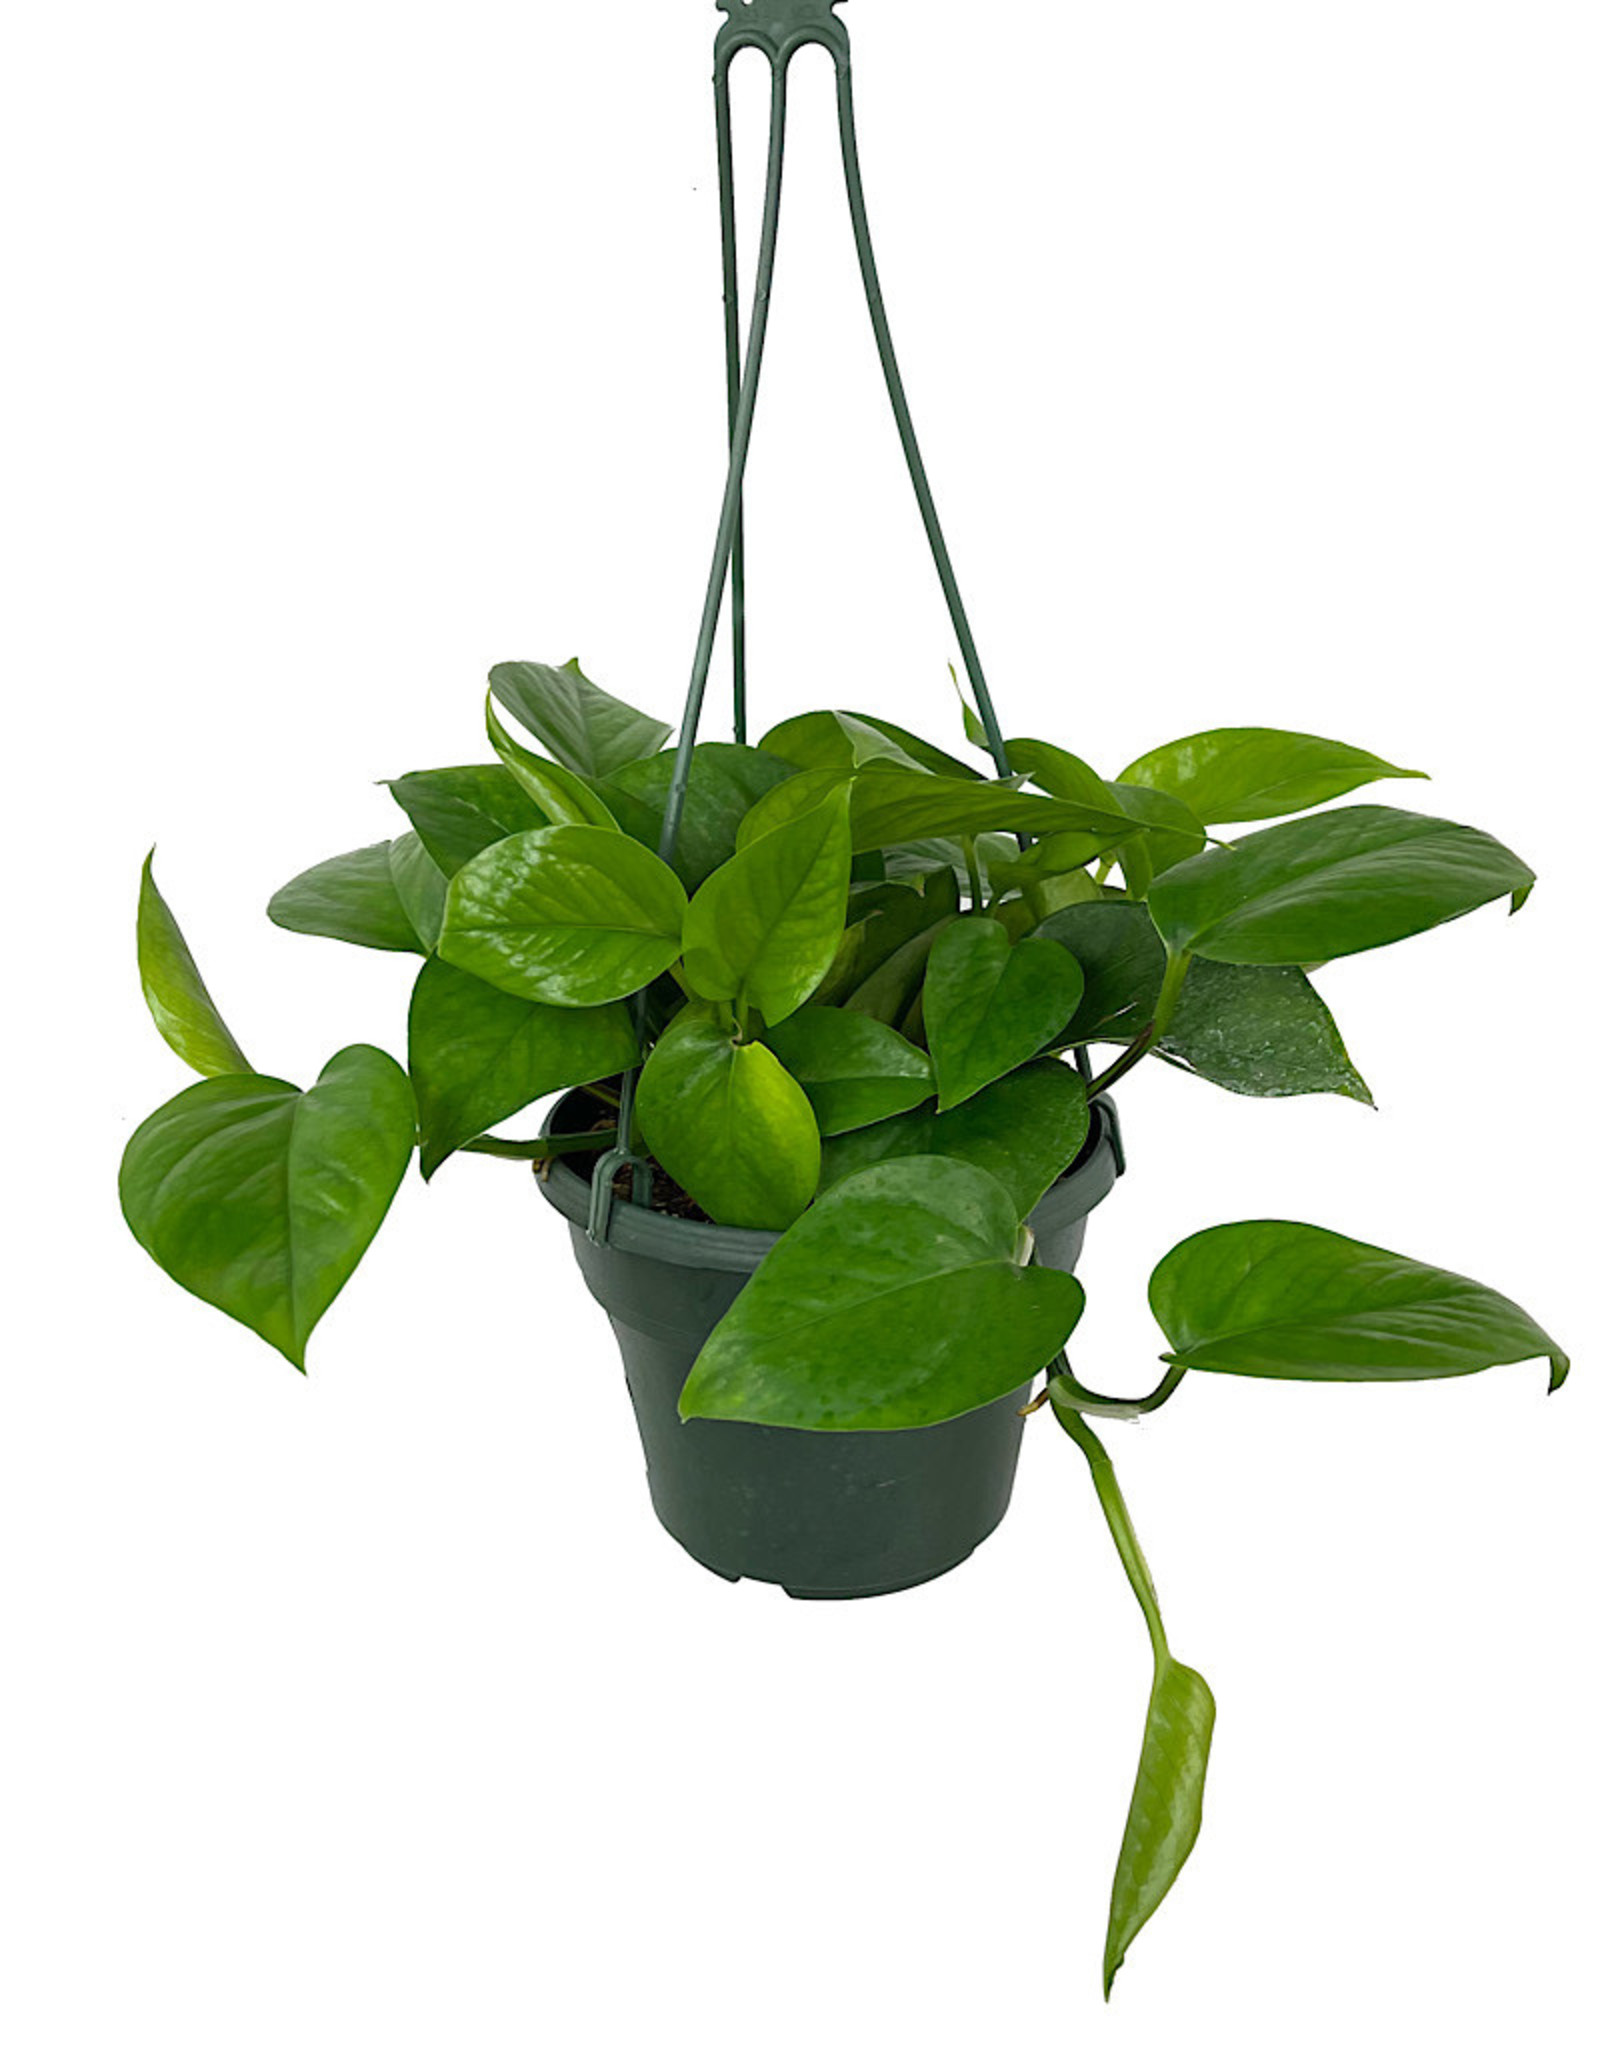 Pothos 'Jade' Hanging Basket 6 Inch